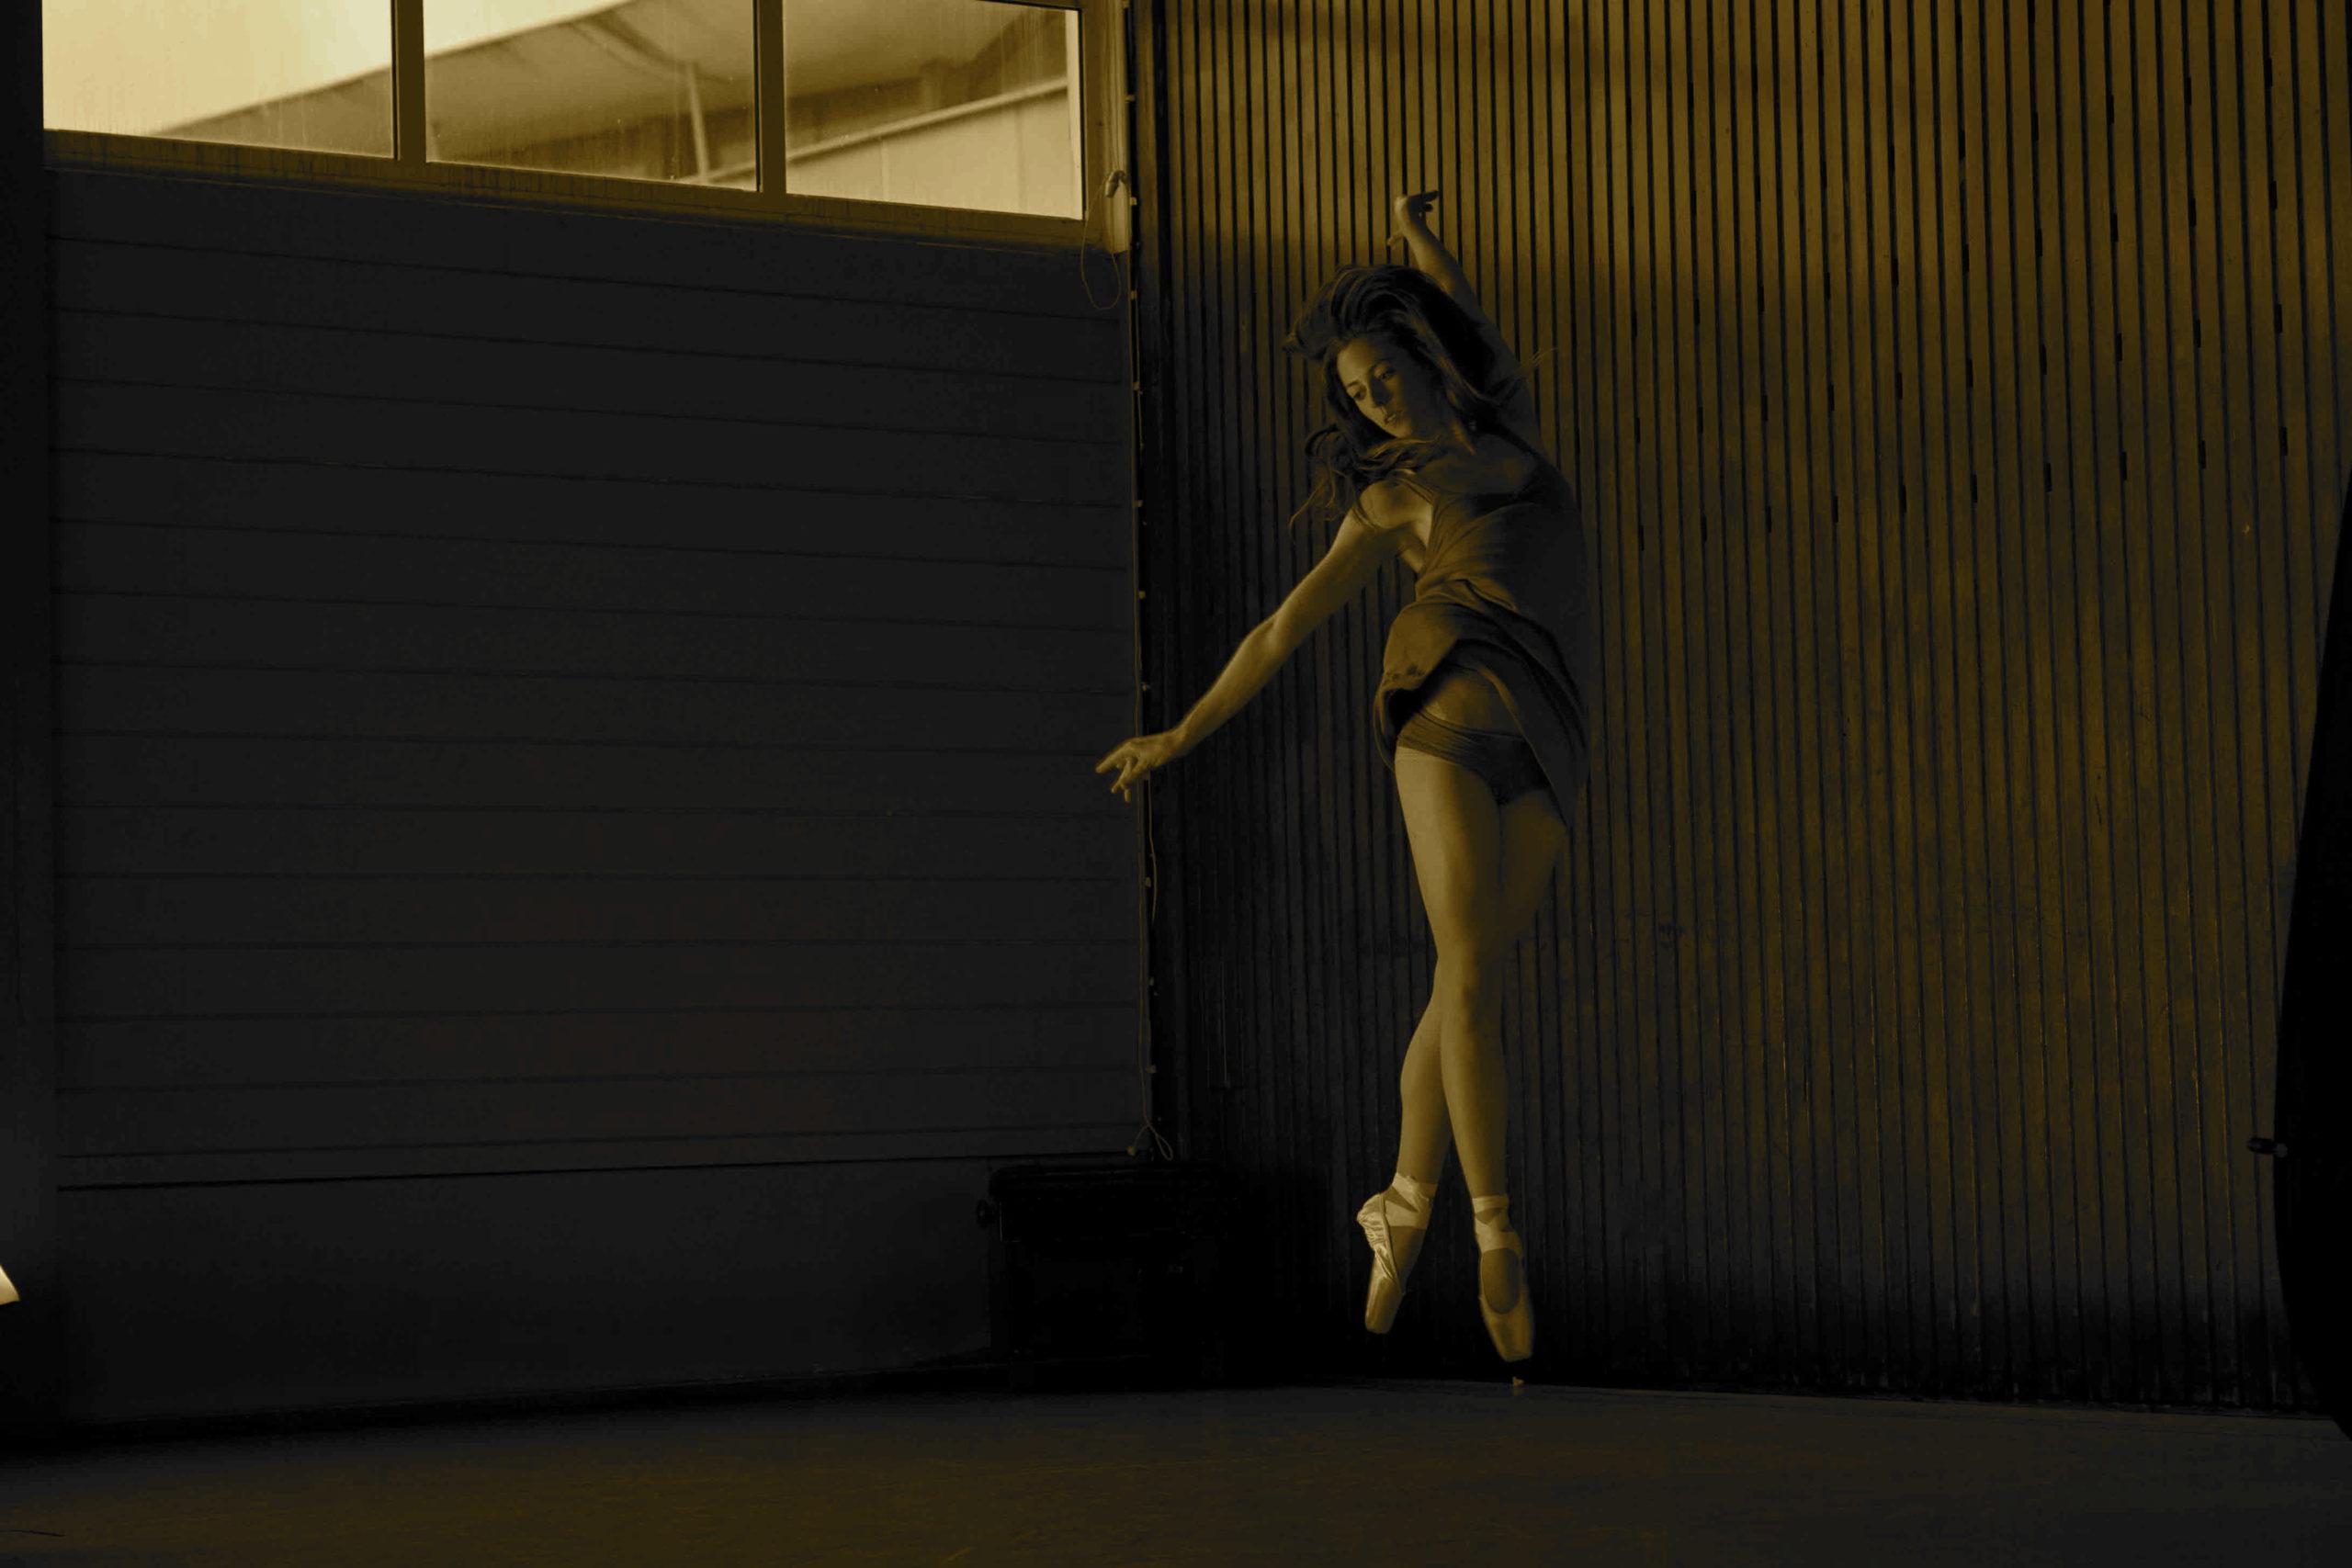 Laura Sarah Dowdall dancer, somatic movement & yoga teacher - www.healingyoga.ie/online-classes/